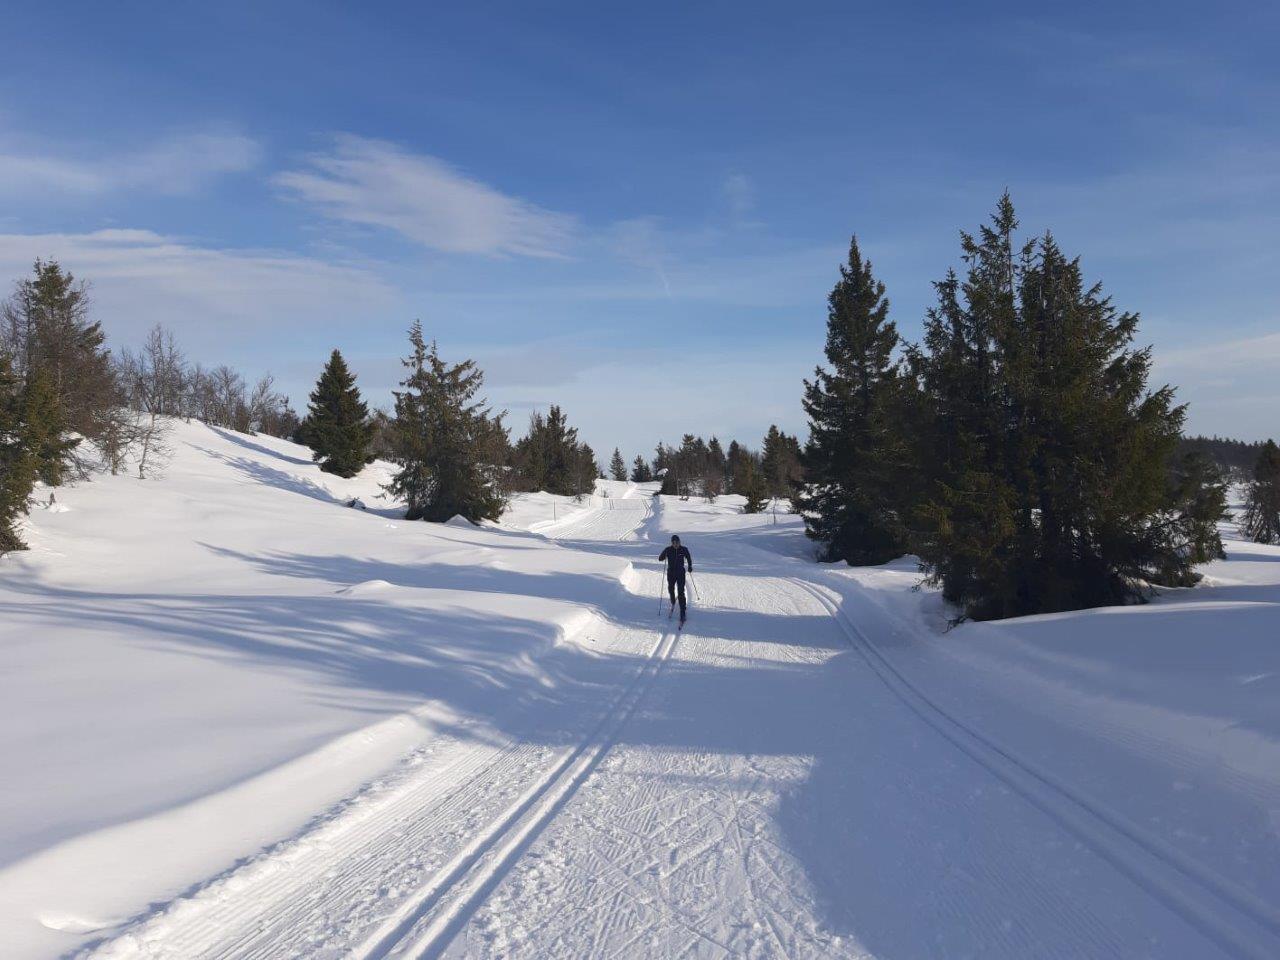 Unterwegs auf den endlosen Loipen von Sjusjoen